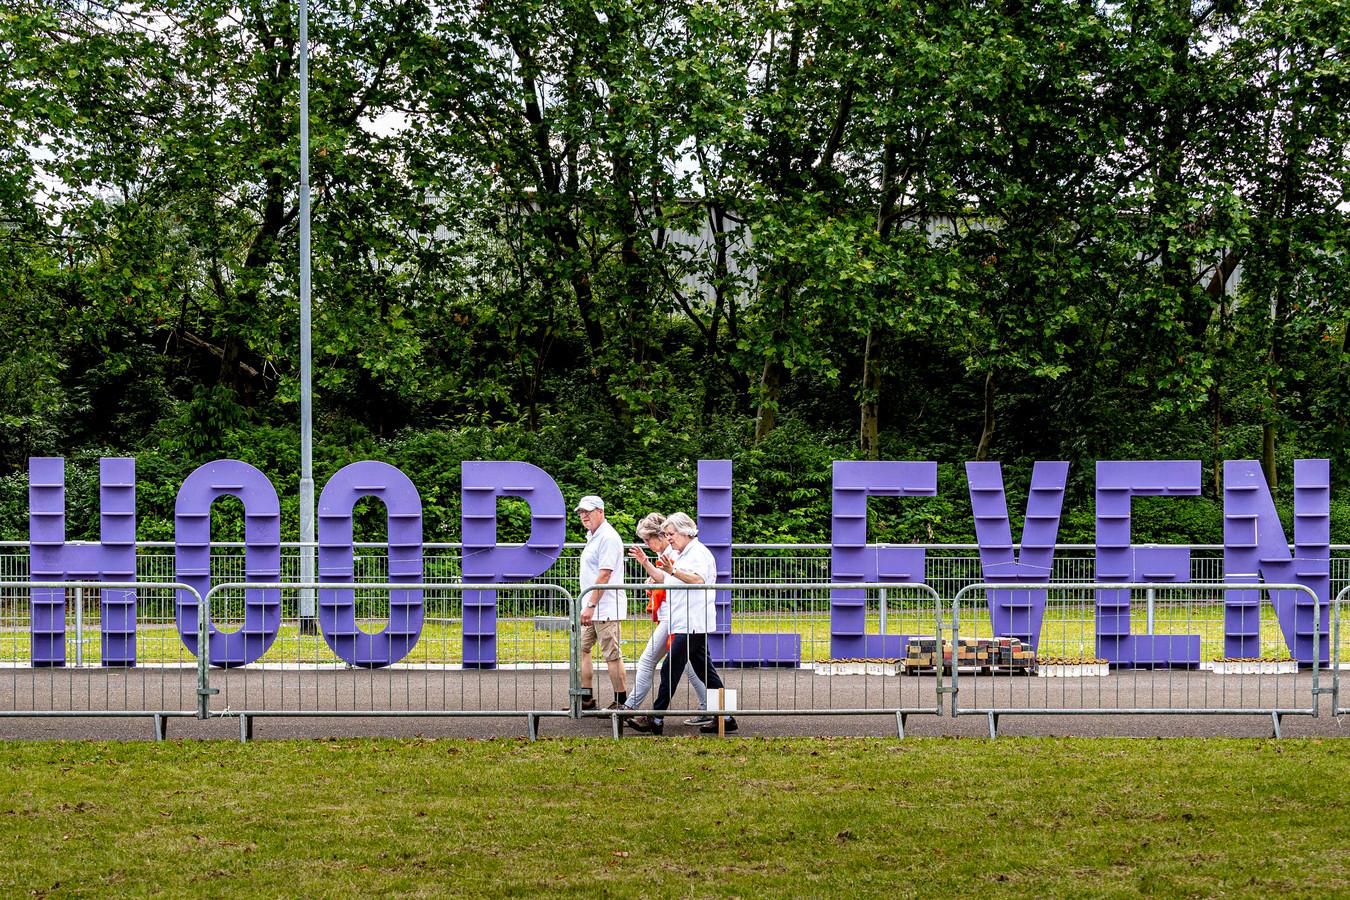 20190616 - ROOSENDAAL Pix4Profs/Tonny Presser - Samenloop voor Hoop op wielerexperience Roosendaal